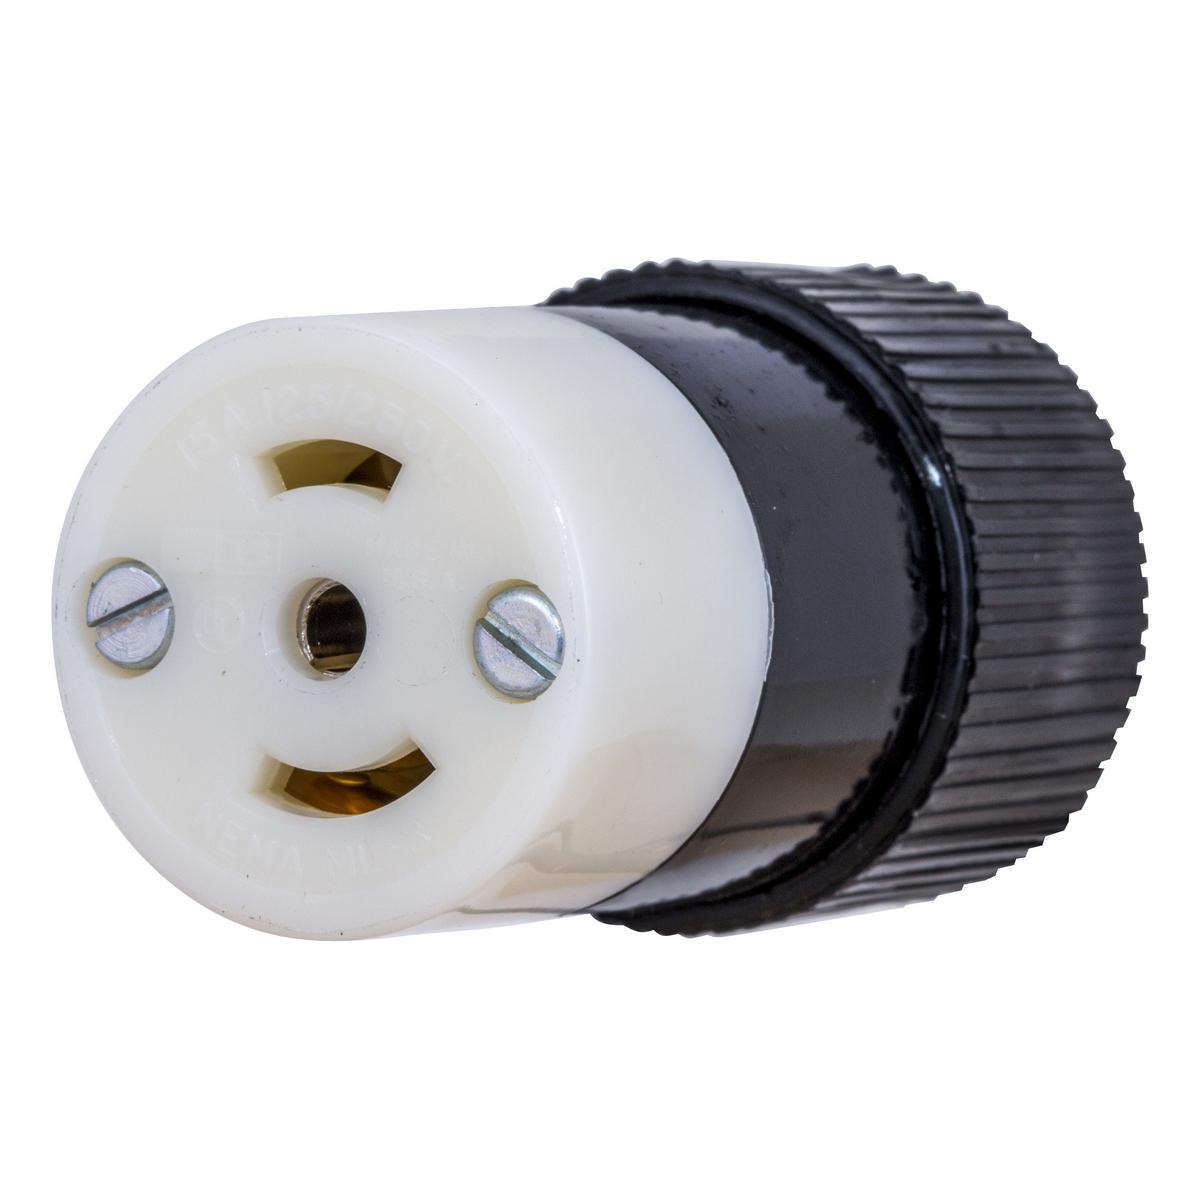 7484nc midget twist lock locking devices wiring devices rh hubbell com bryant wiring devices distributors Bryant Wiring Devices Catalog